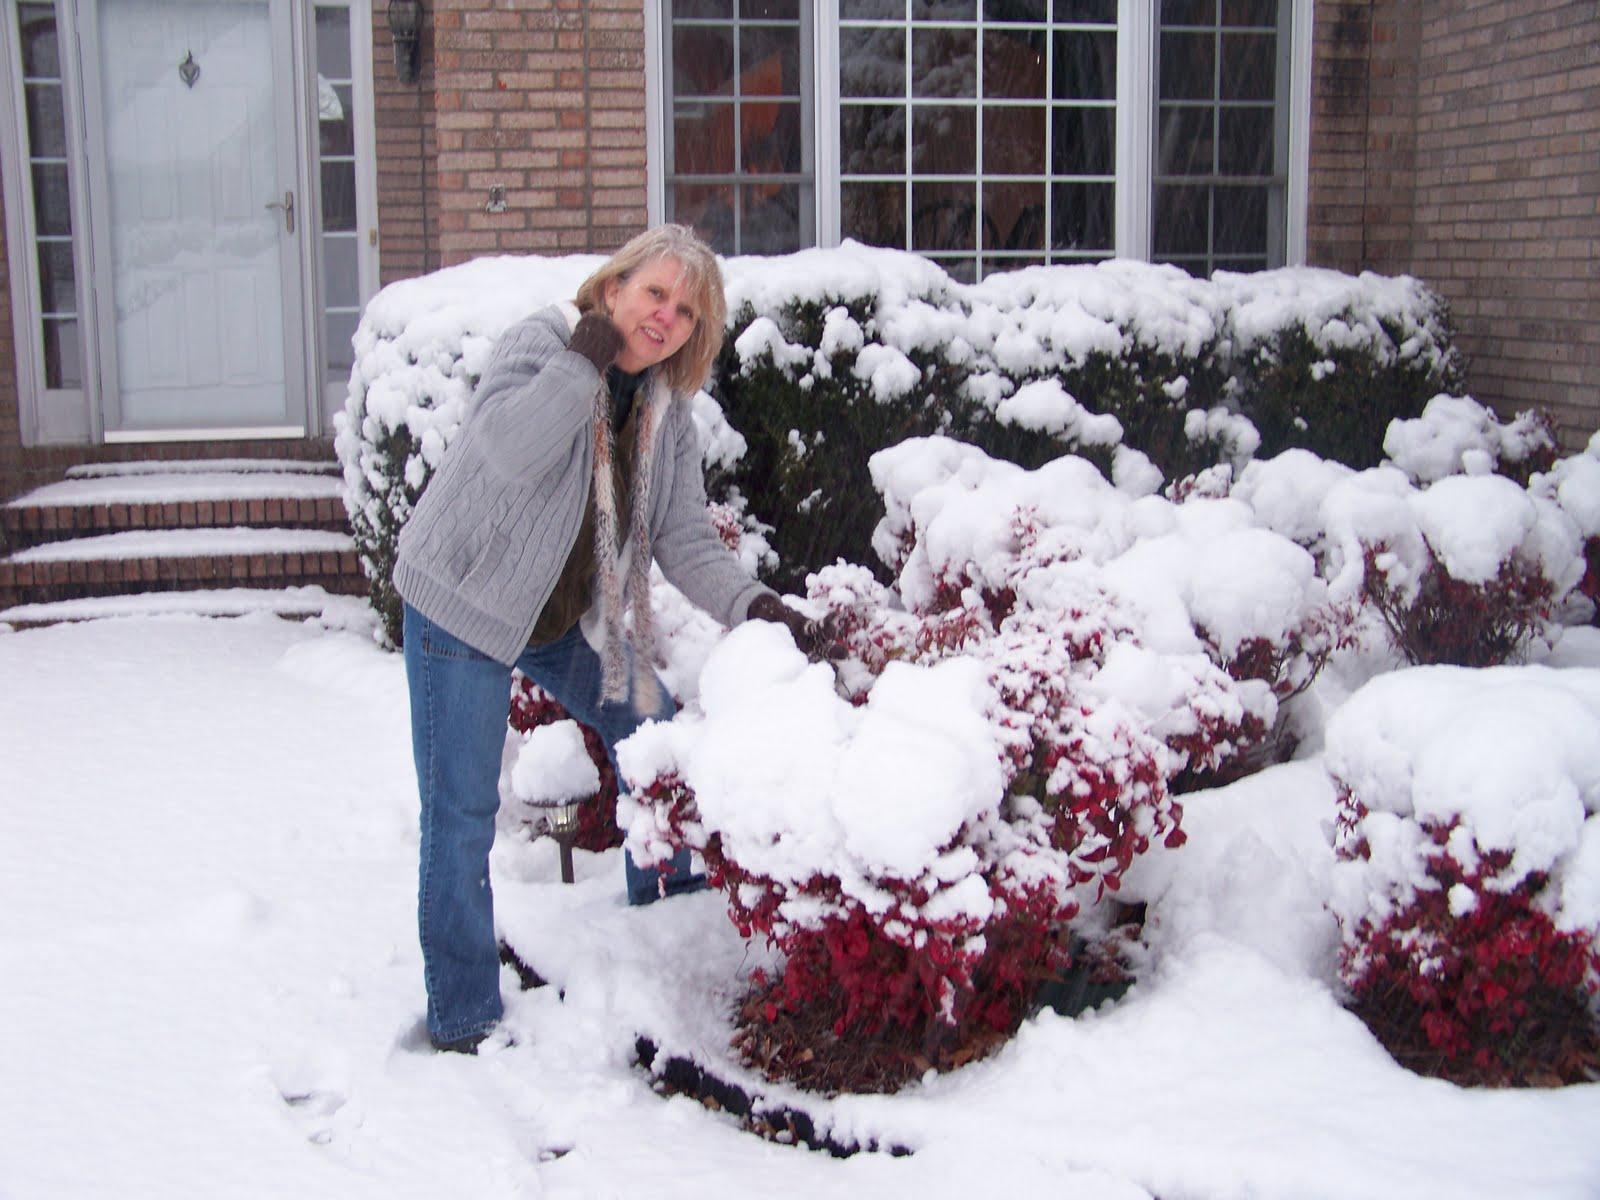 [snow+of+feb+2010+010.JPG]